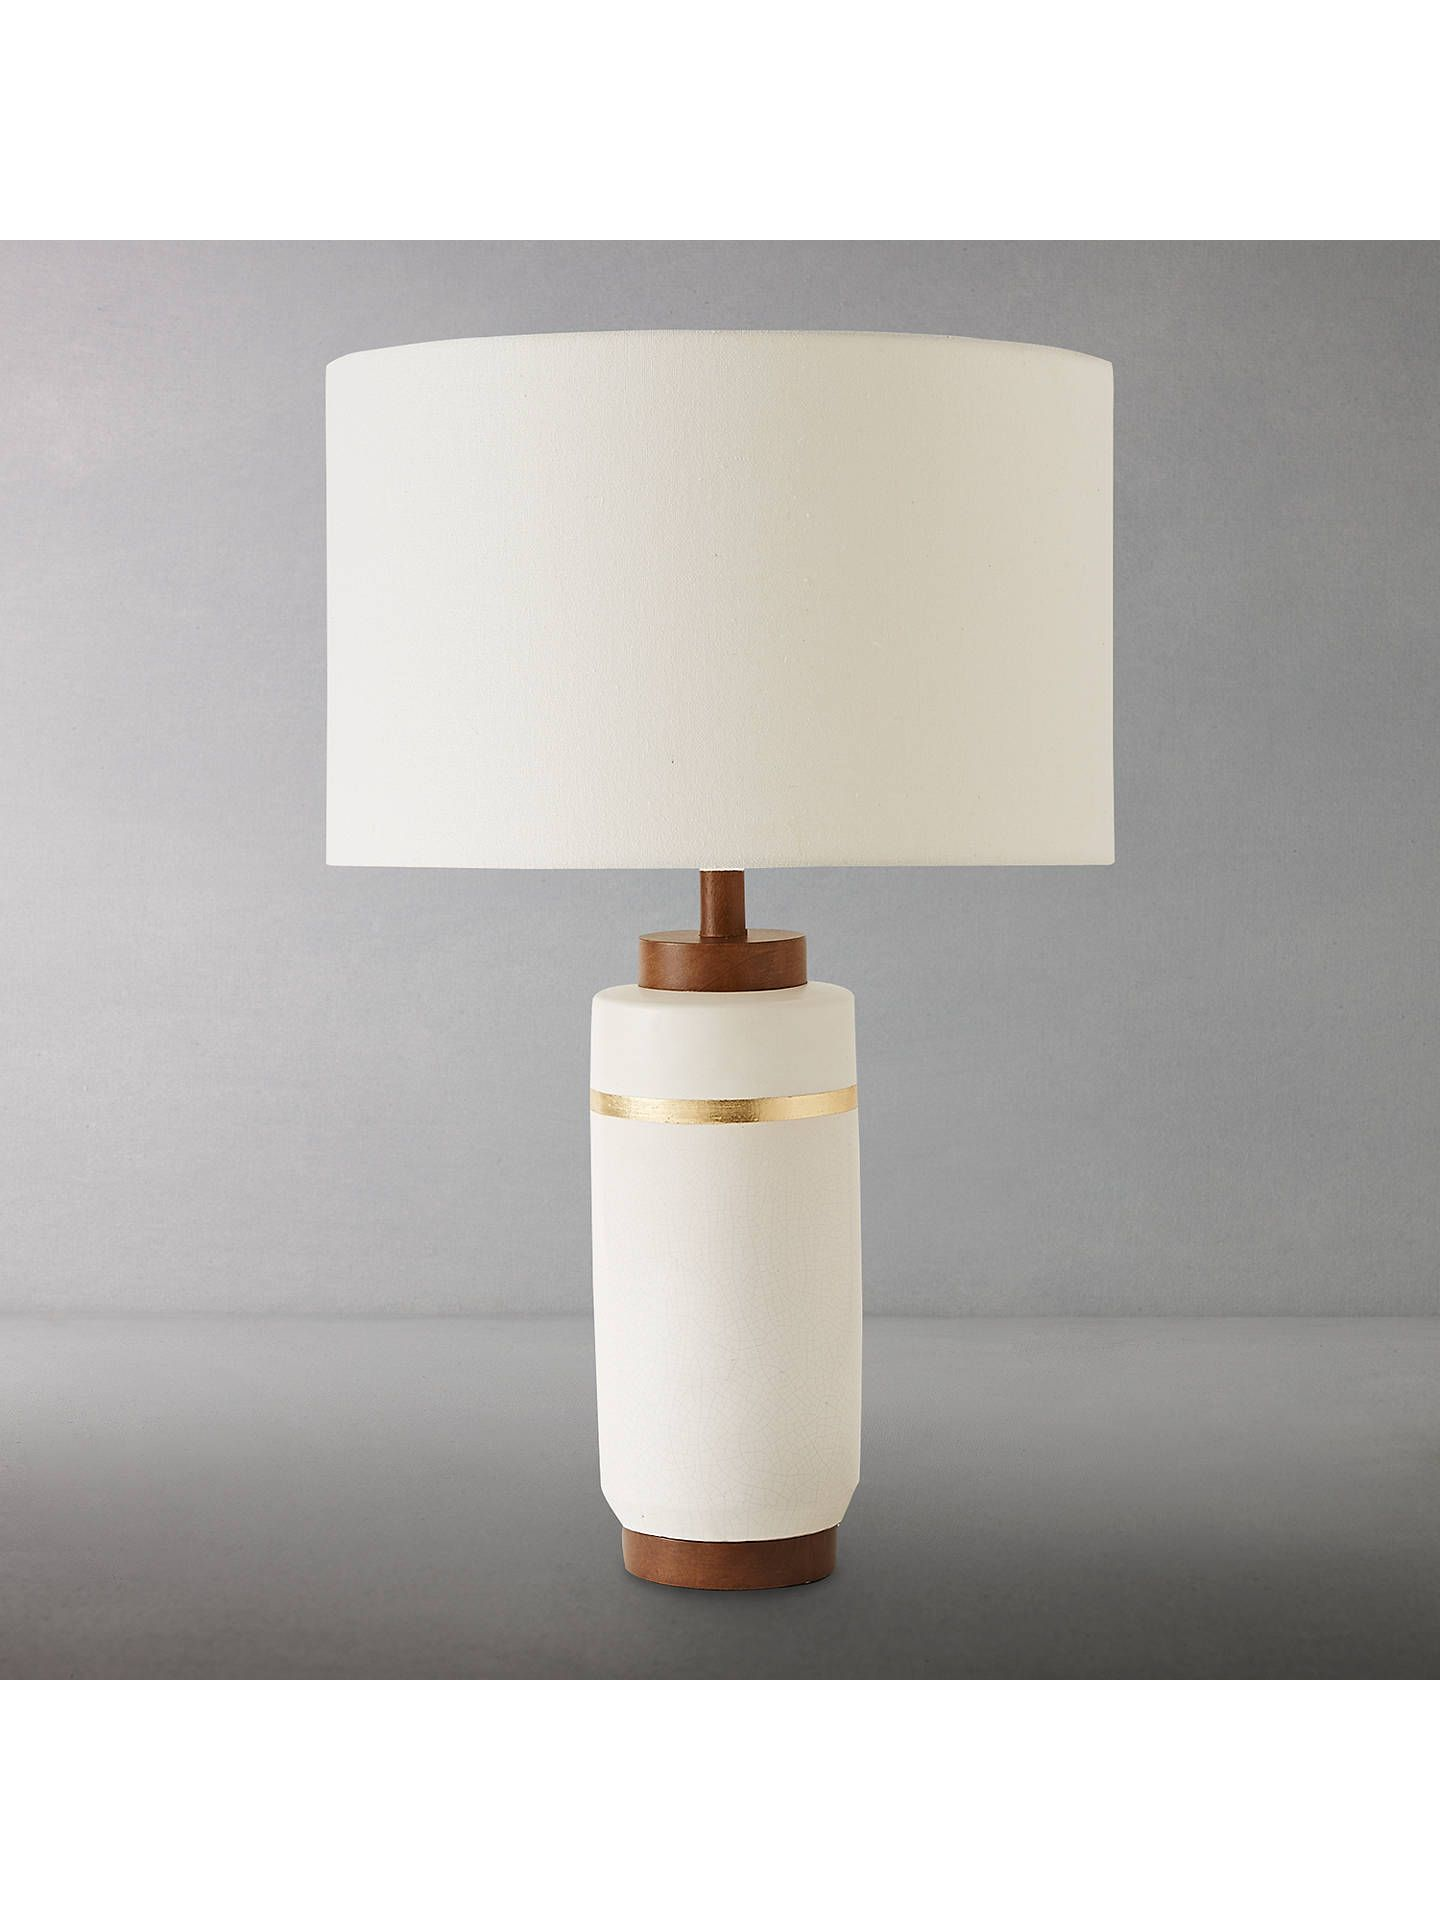 Roar Rabbit For West Elm Crackle Glaze Table Lamp Large White